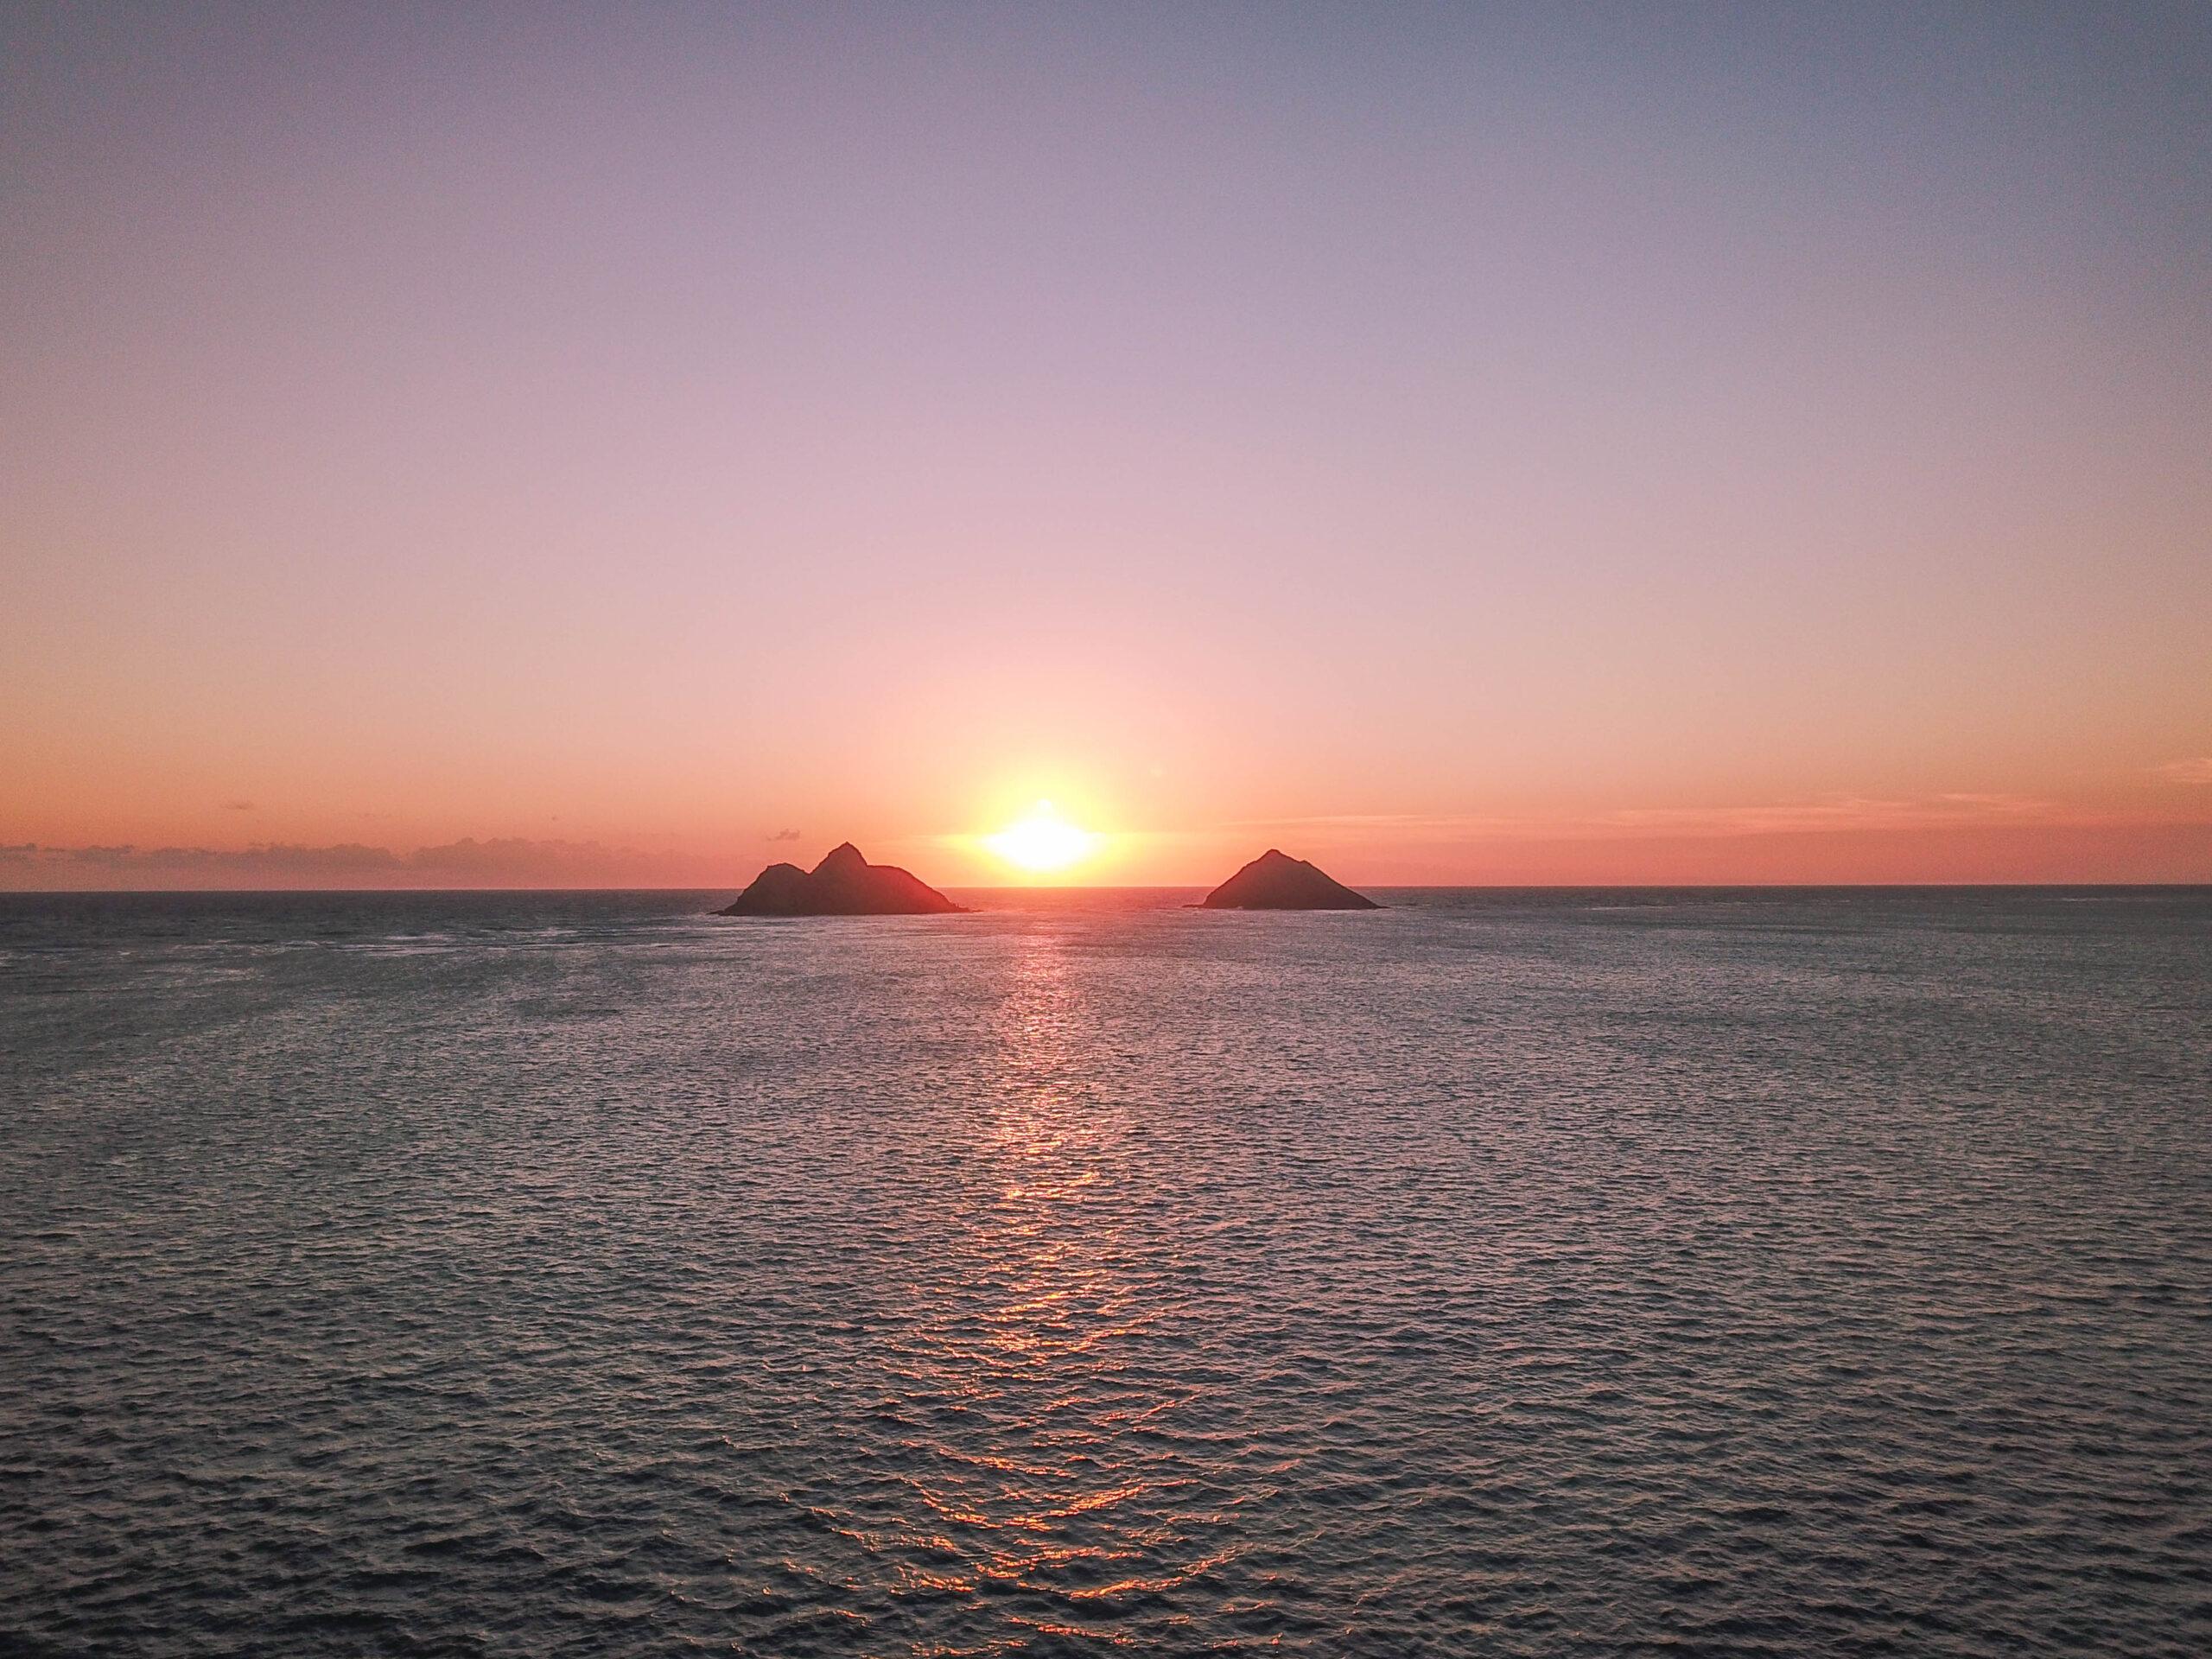 Mokulua Islands - Lanikai Beach, Oahu Hawaii